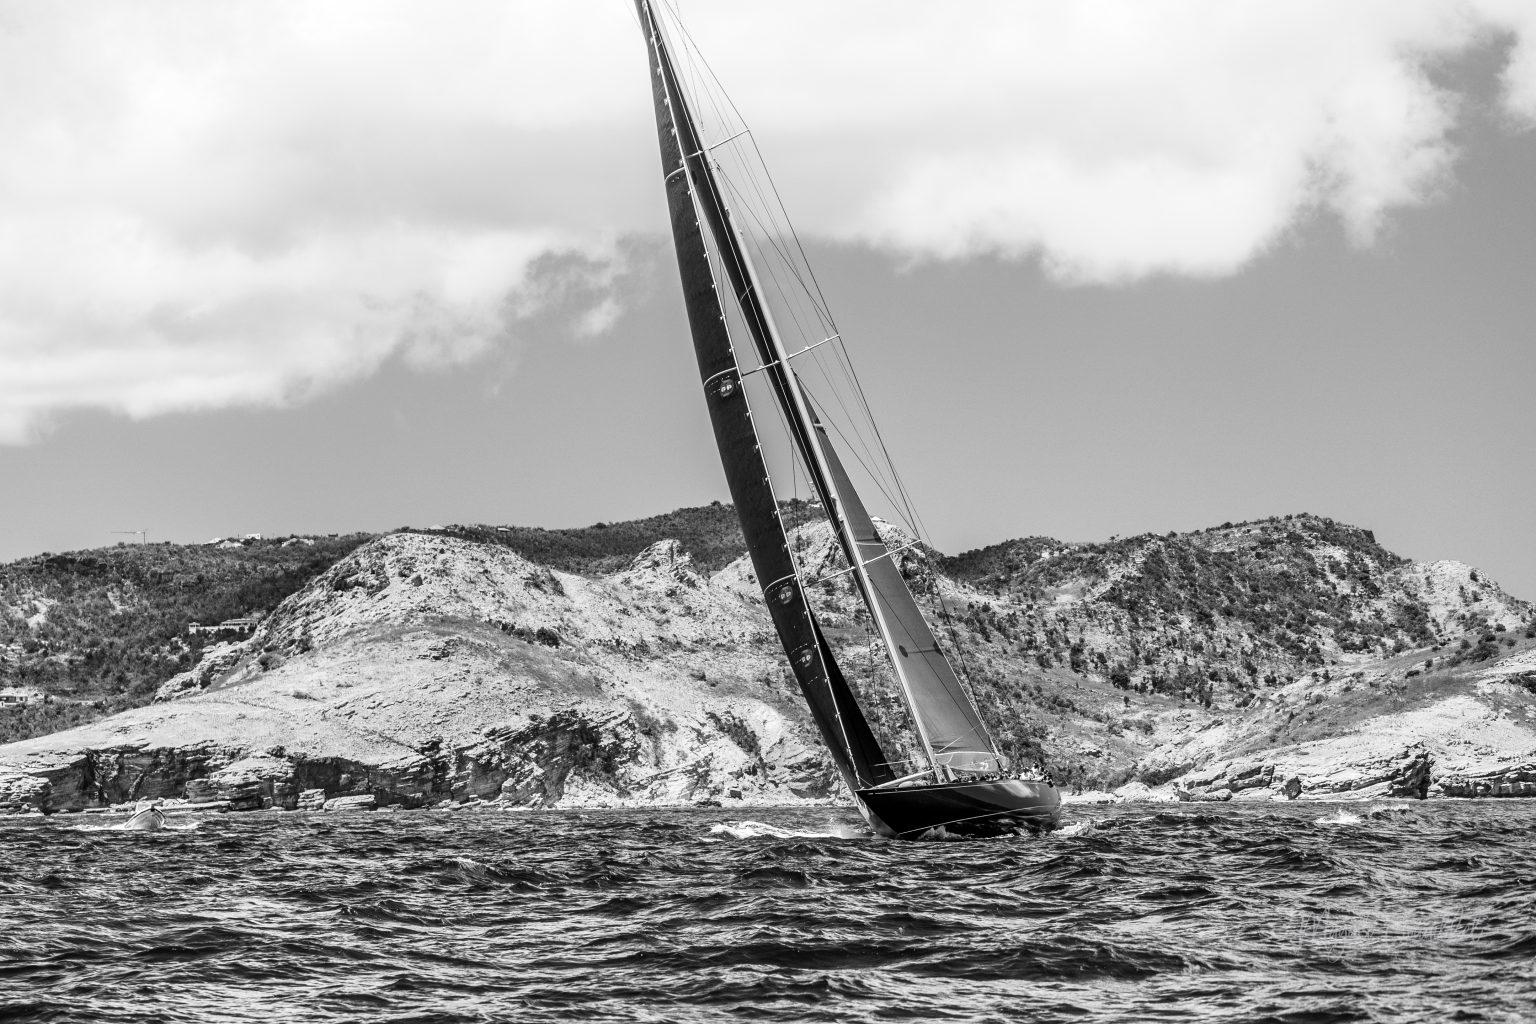 Sail Yacht, Bucket Regatta 2019 St Barths-3